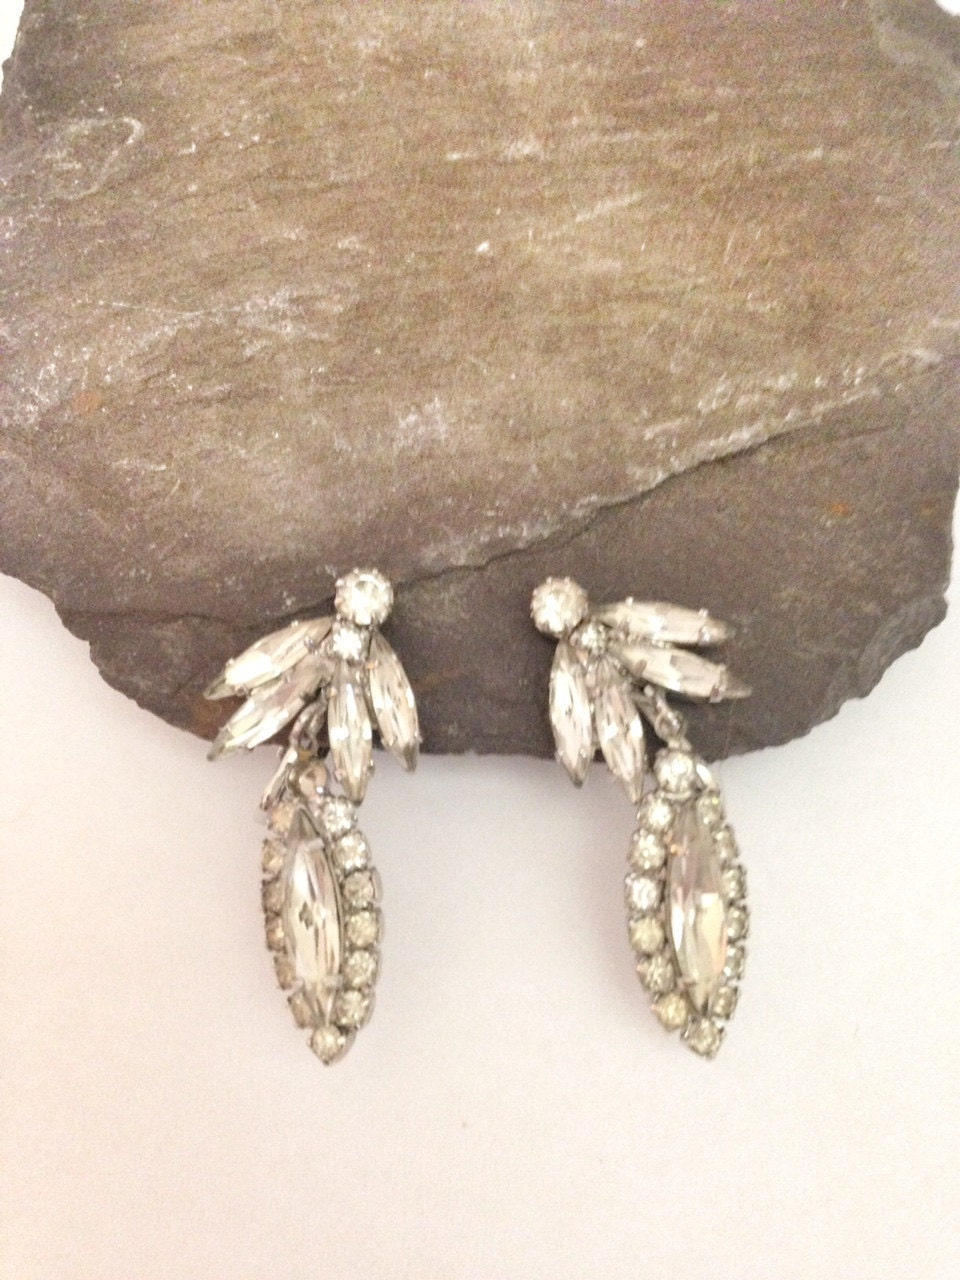 albert weiss jewelry eBay